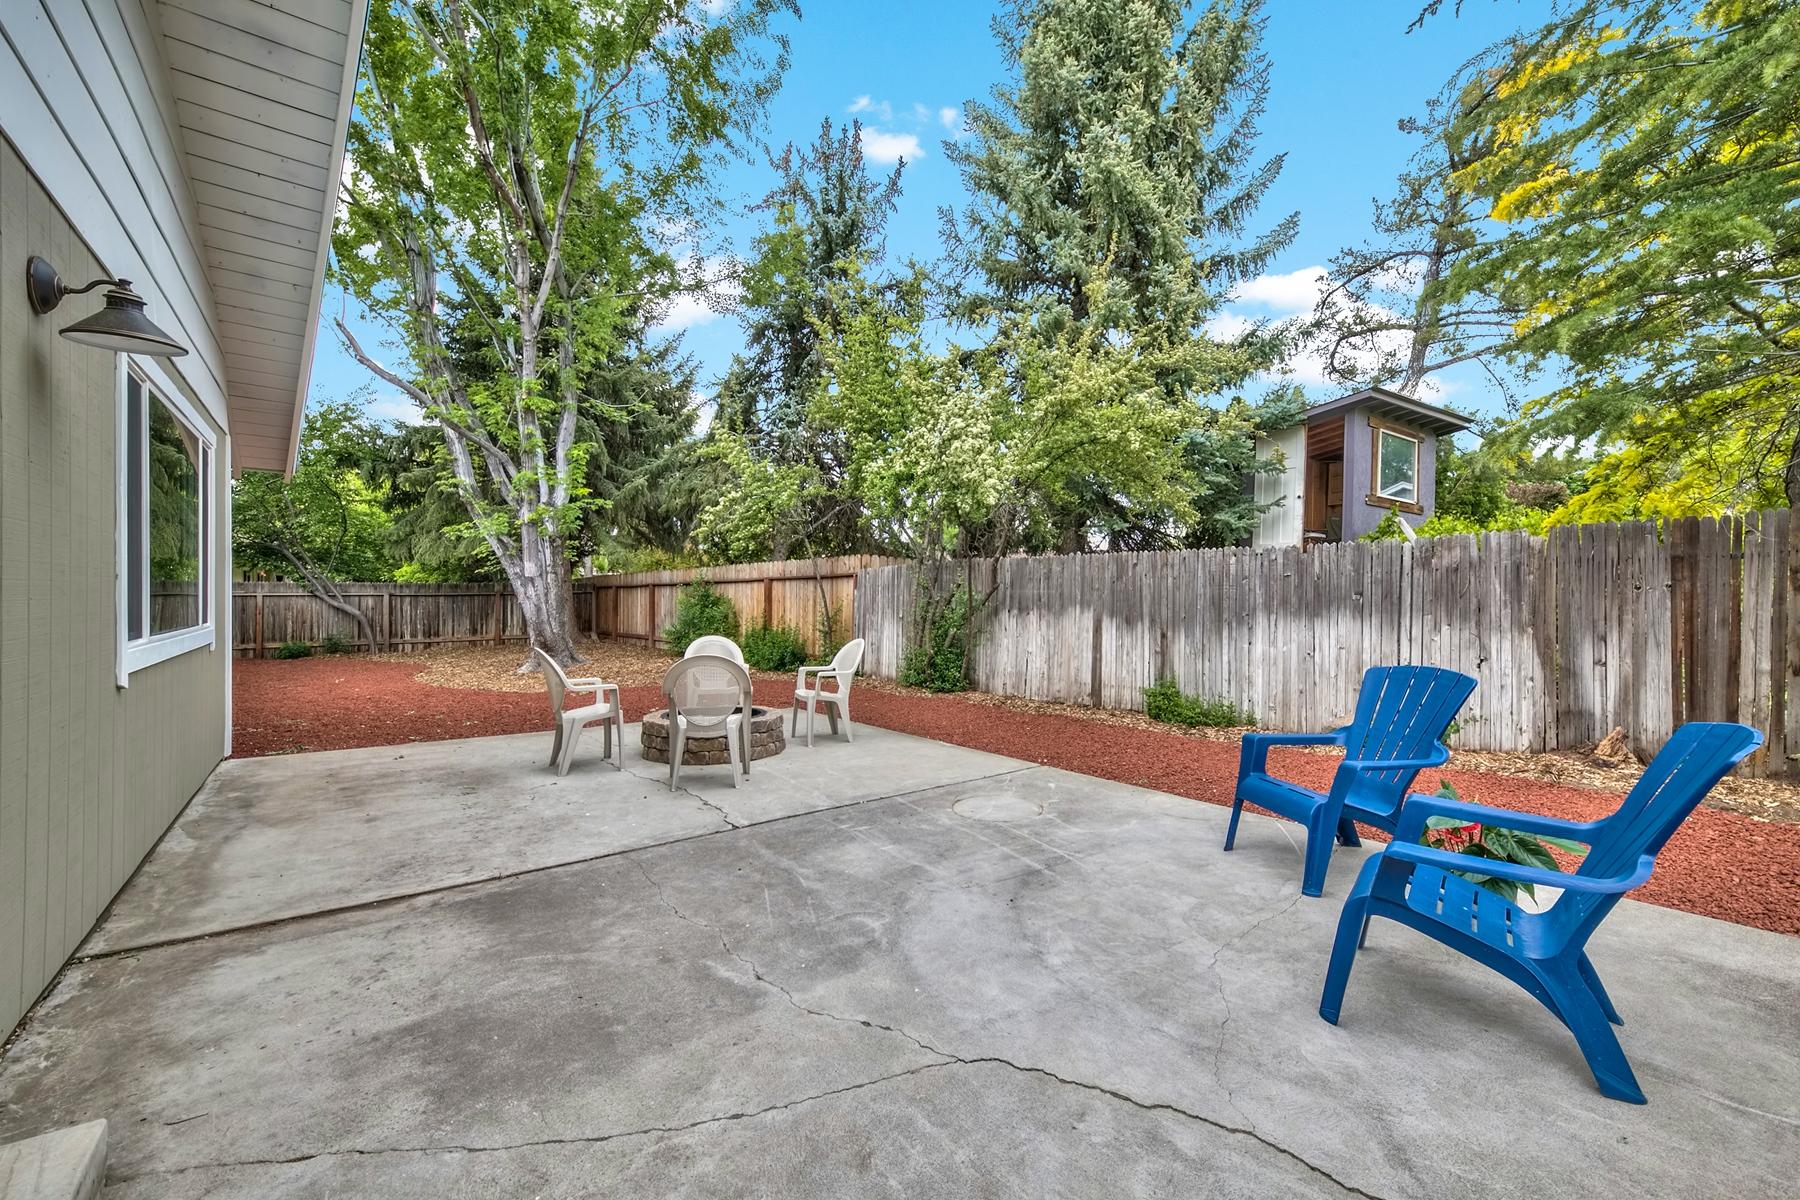 Additional photo for property listing at 2845 Knight Road, Reno, Nevada 2845 Knight Rd. Reno, Nevada 89509 United States